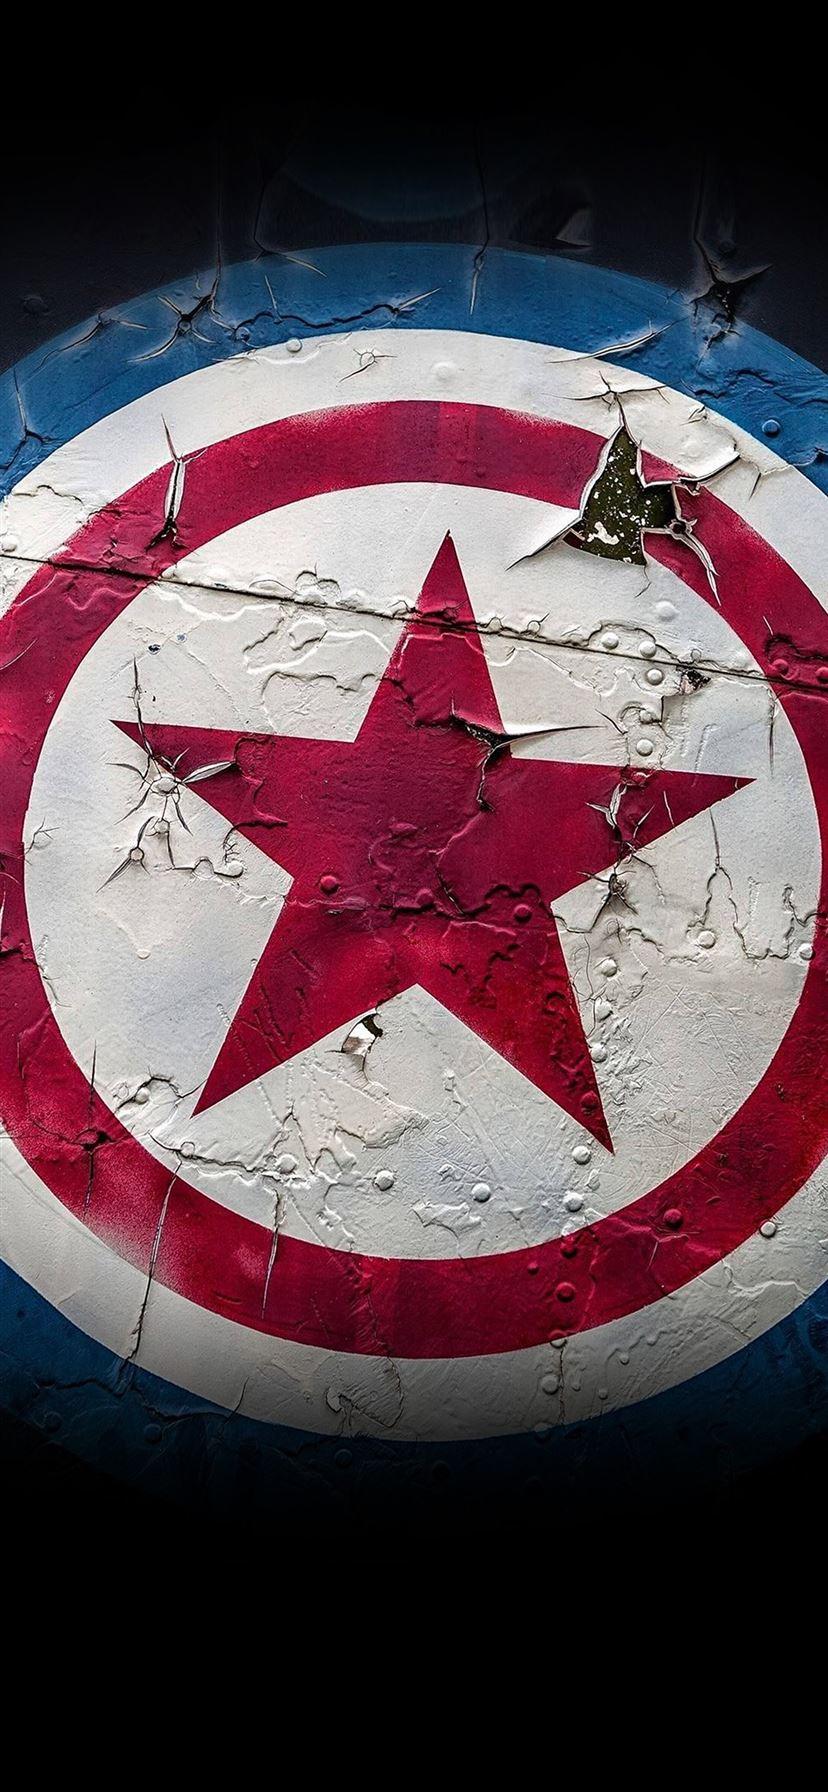 Captain America Marvel Hero Iphone 11 Wallpapers Free Download